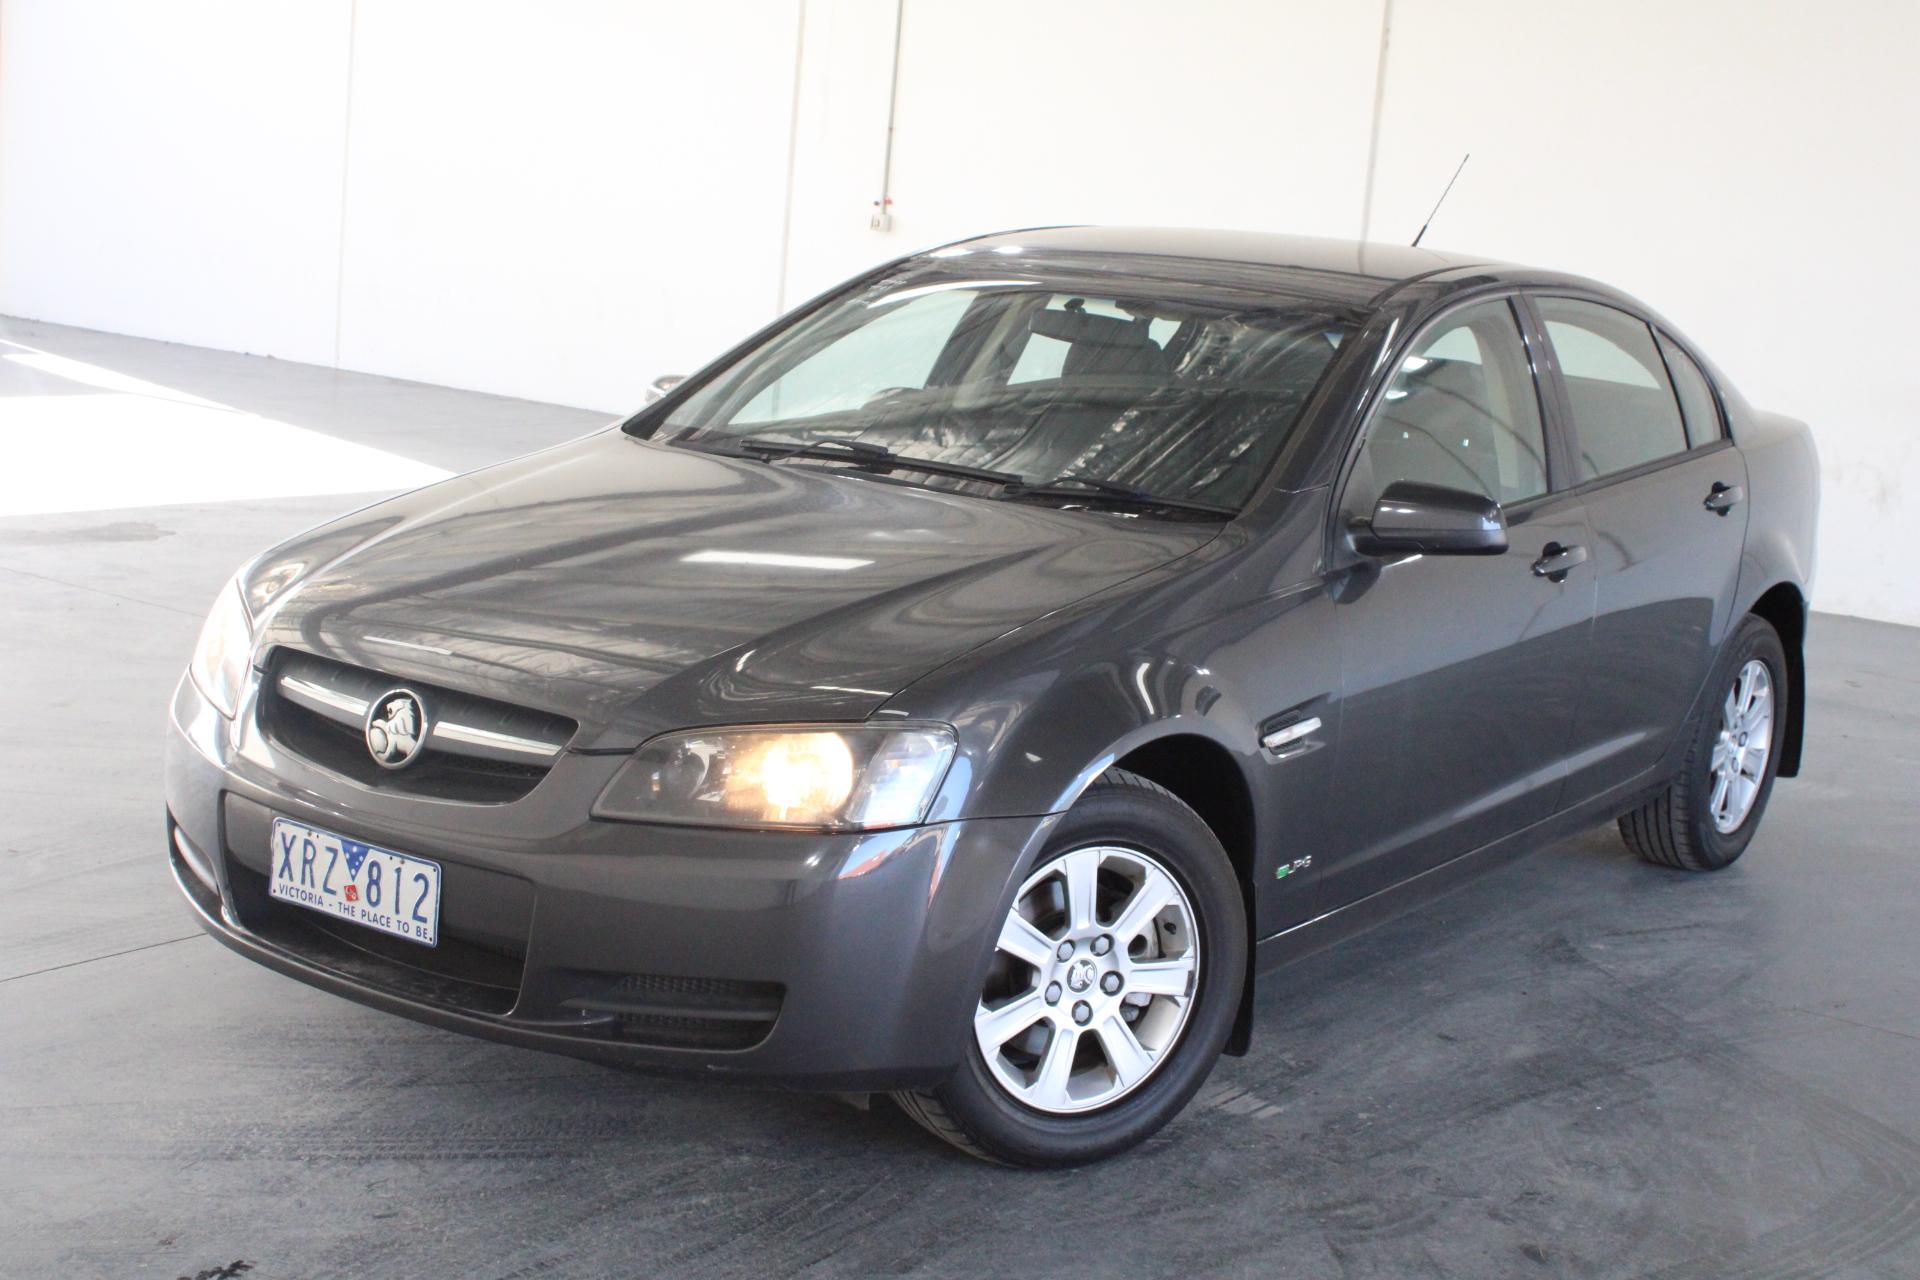 2010 Holden Commodore Omega VE Automatic Sedan